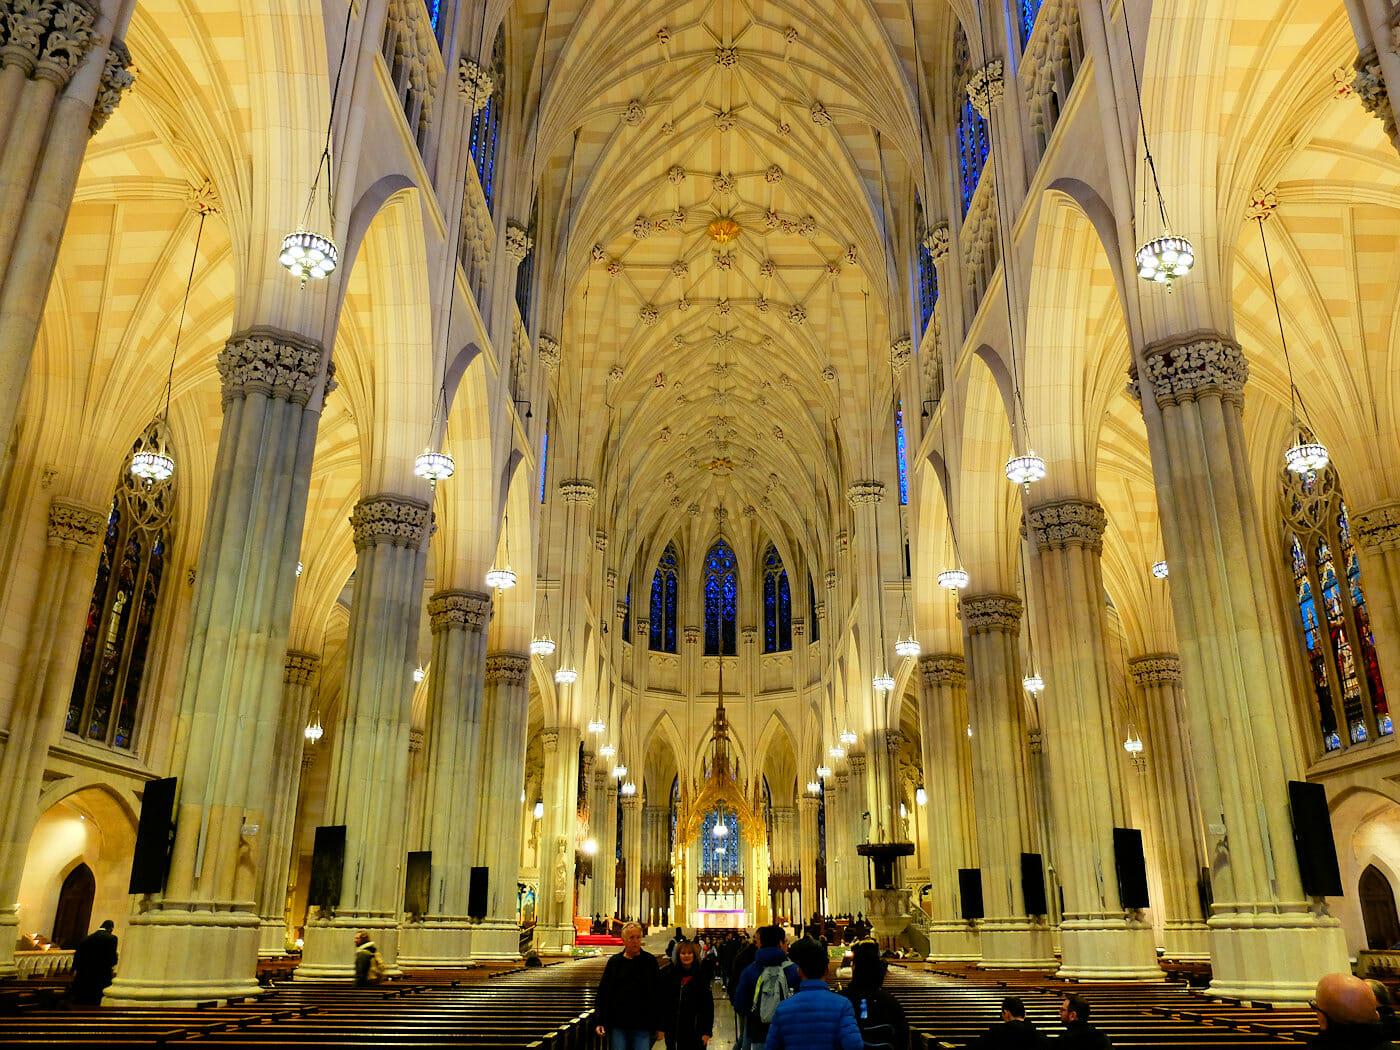 St. Patrick's Cathedral i New York - Fascinerande arkitektur